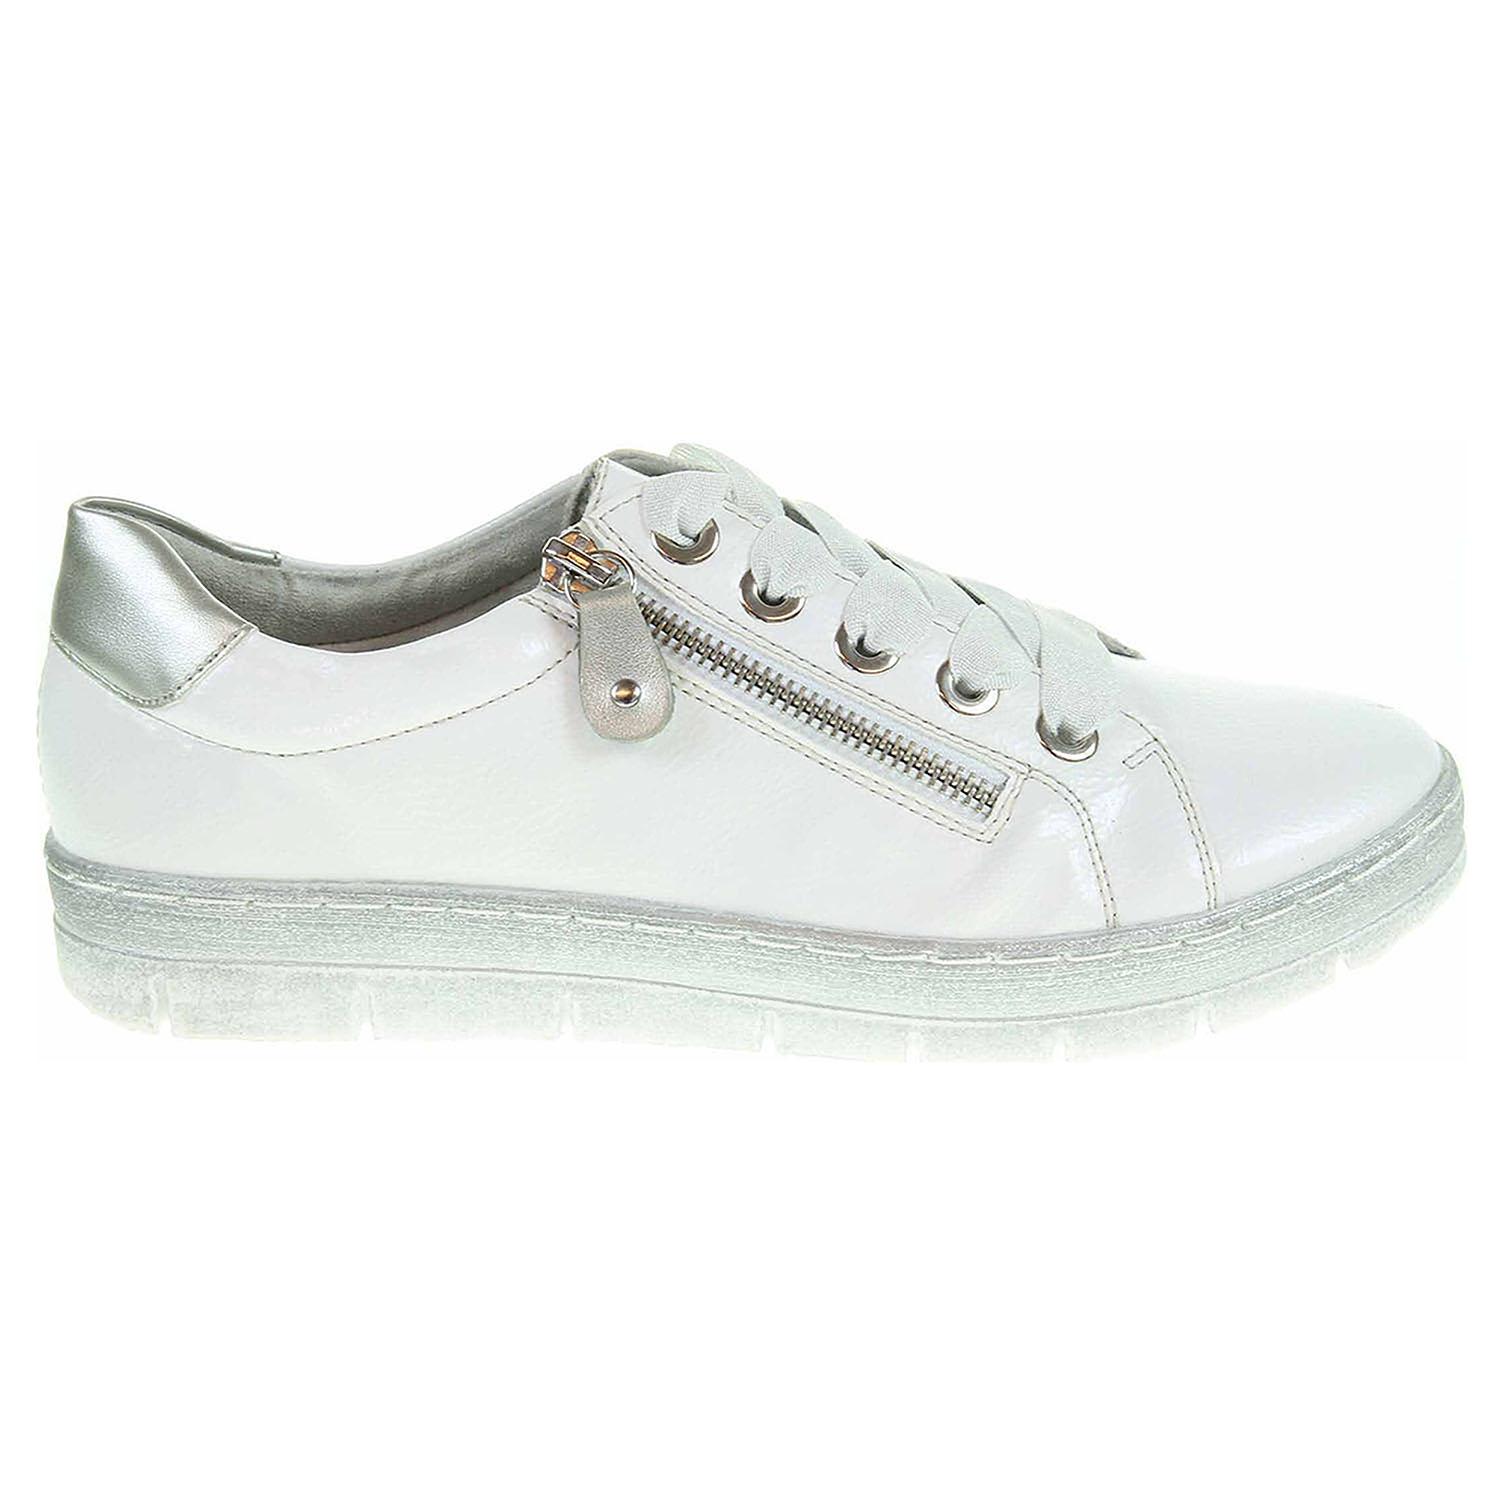 Remonte dámská obuv D5803-80 weiss kombi D5803-80 43